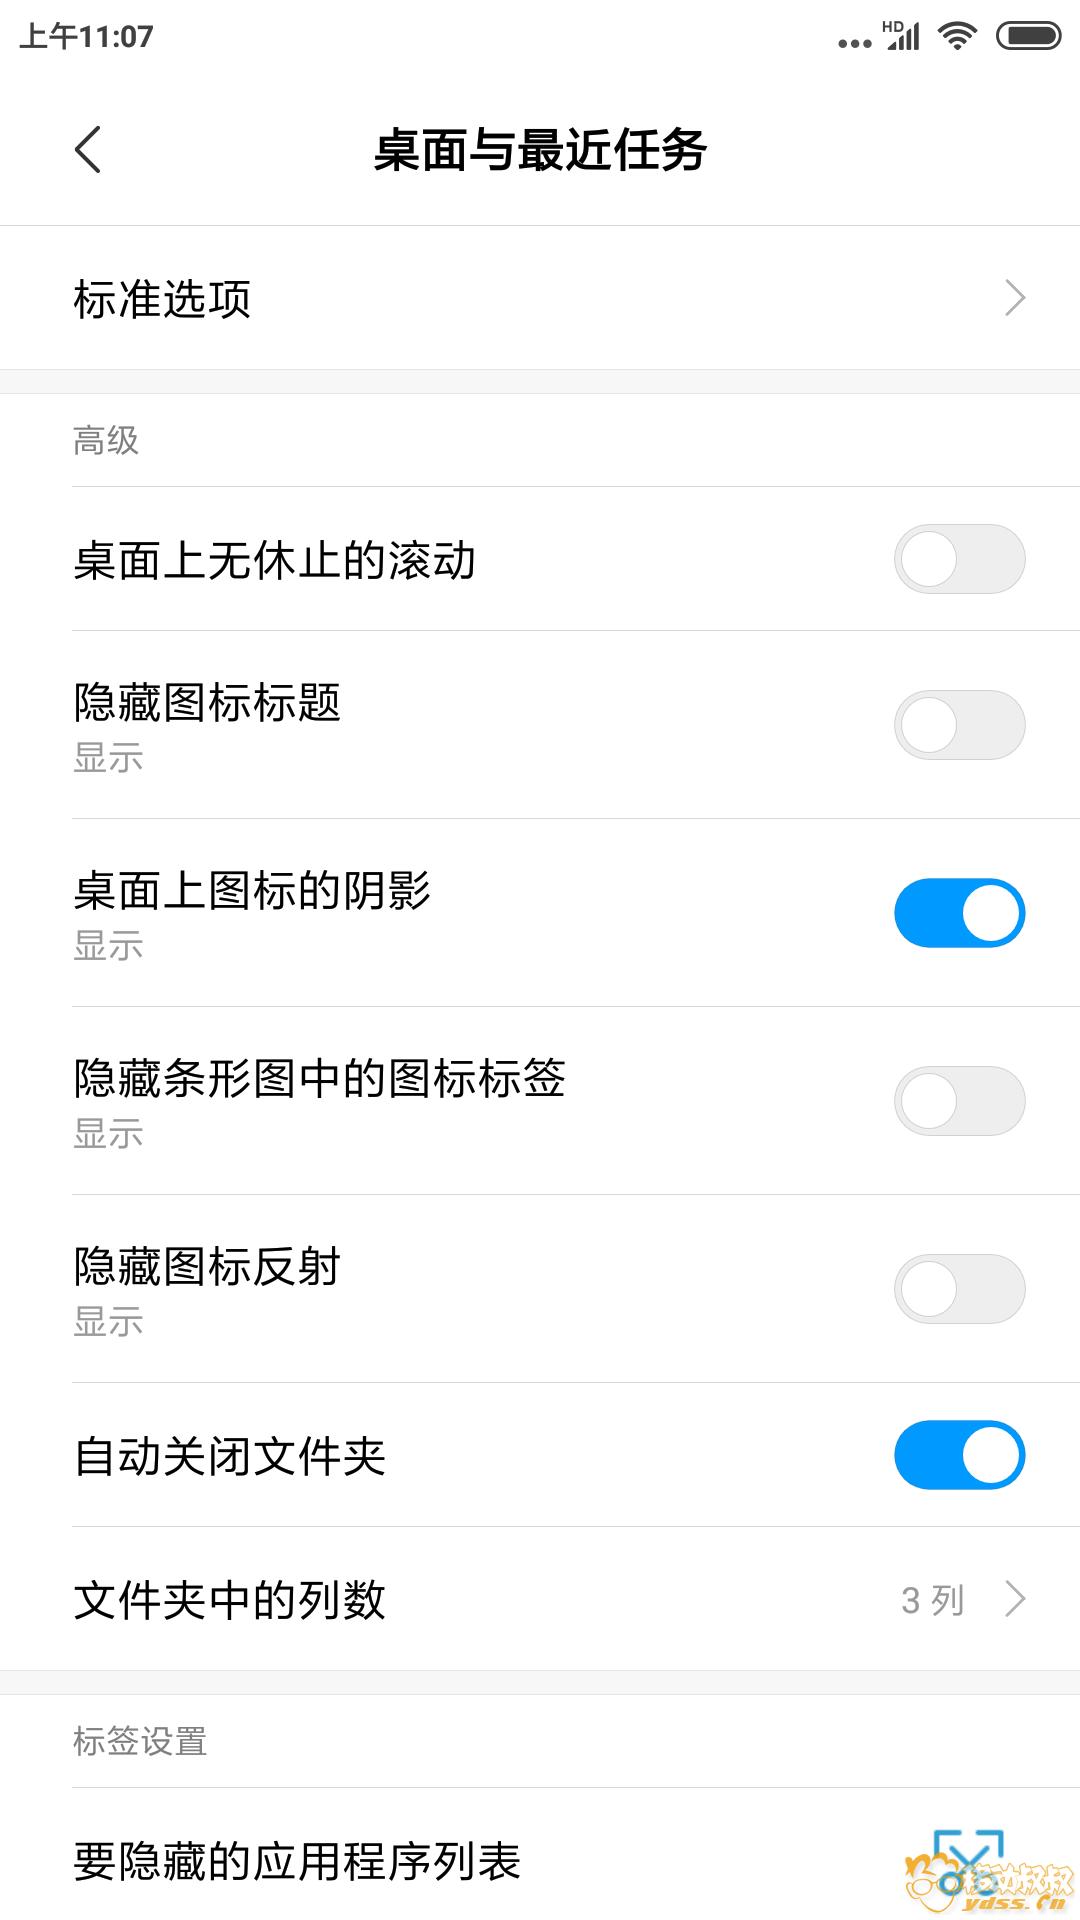 Screenshot_2018-07-02-11-07-20-423_com.android.settings.png